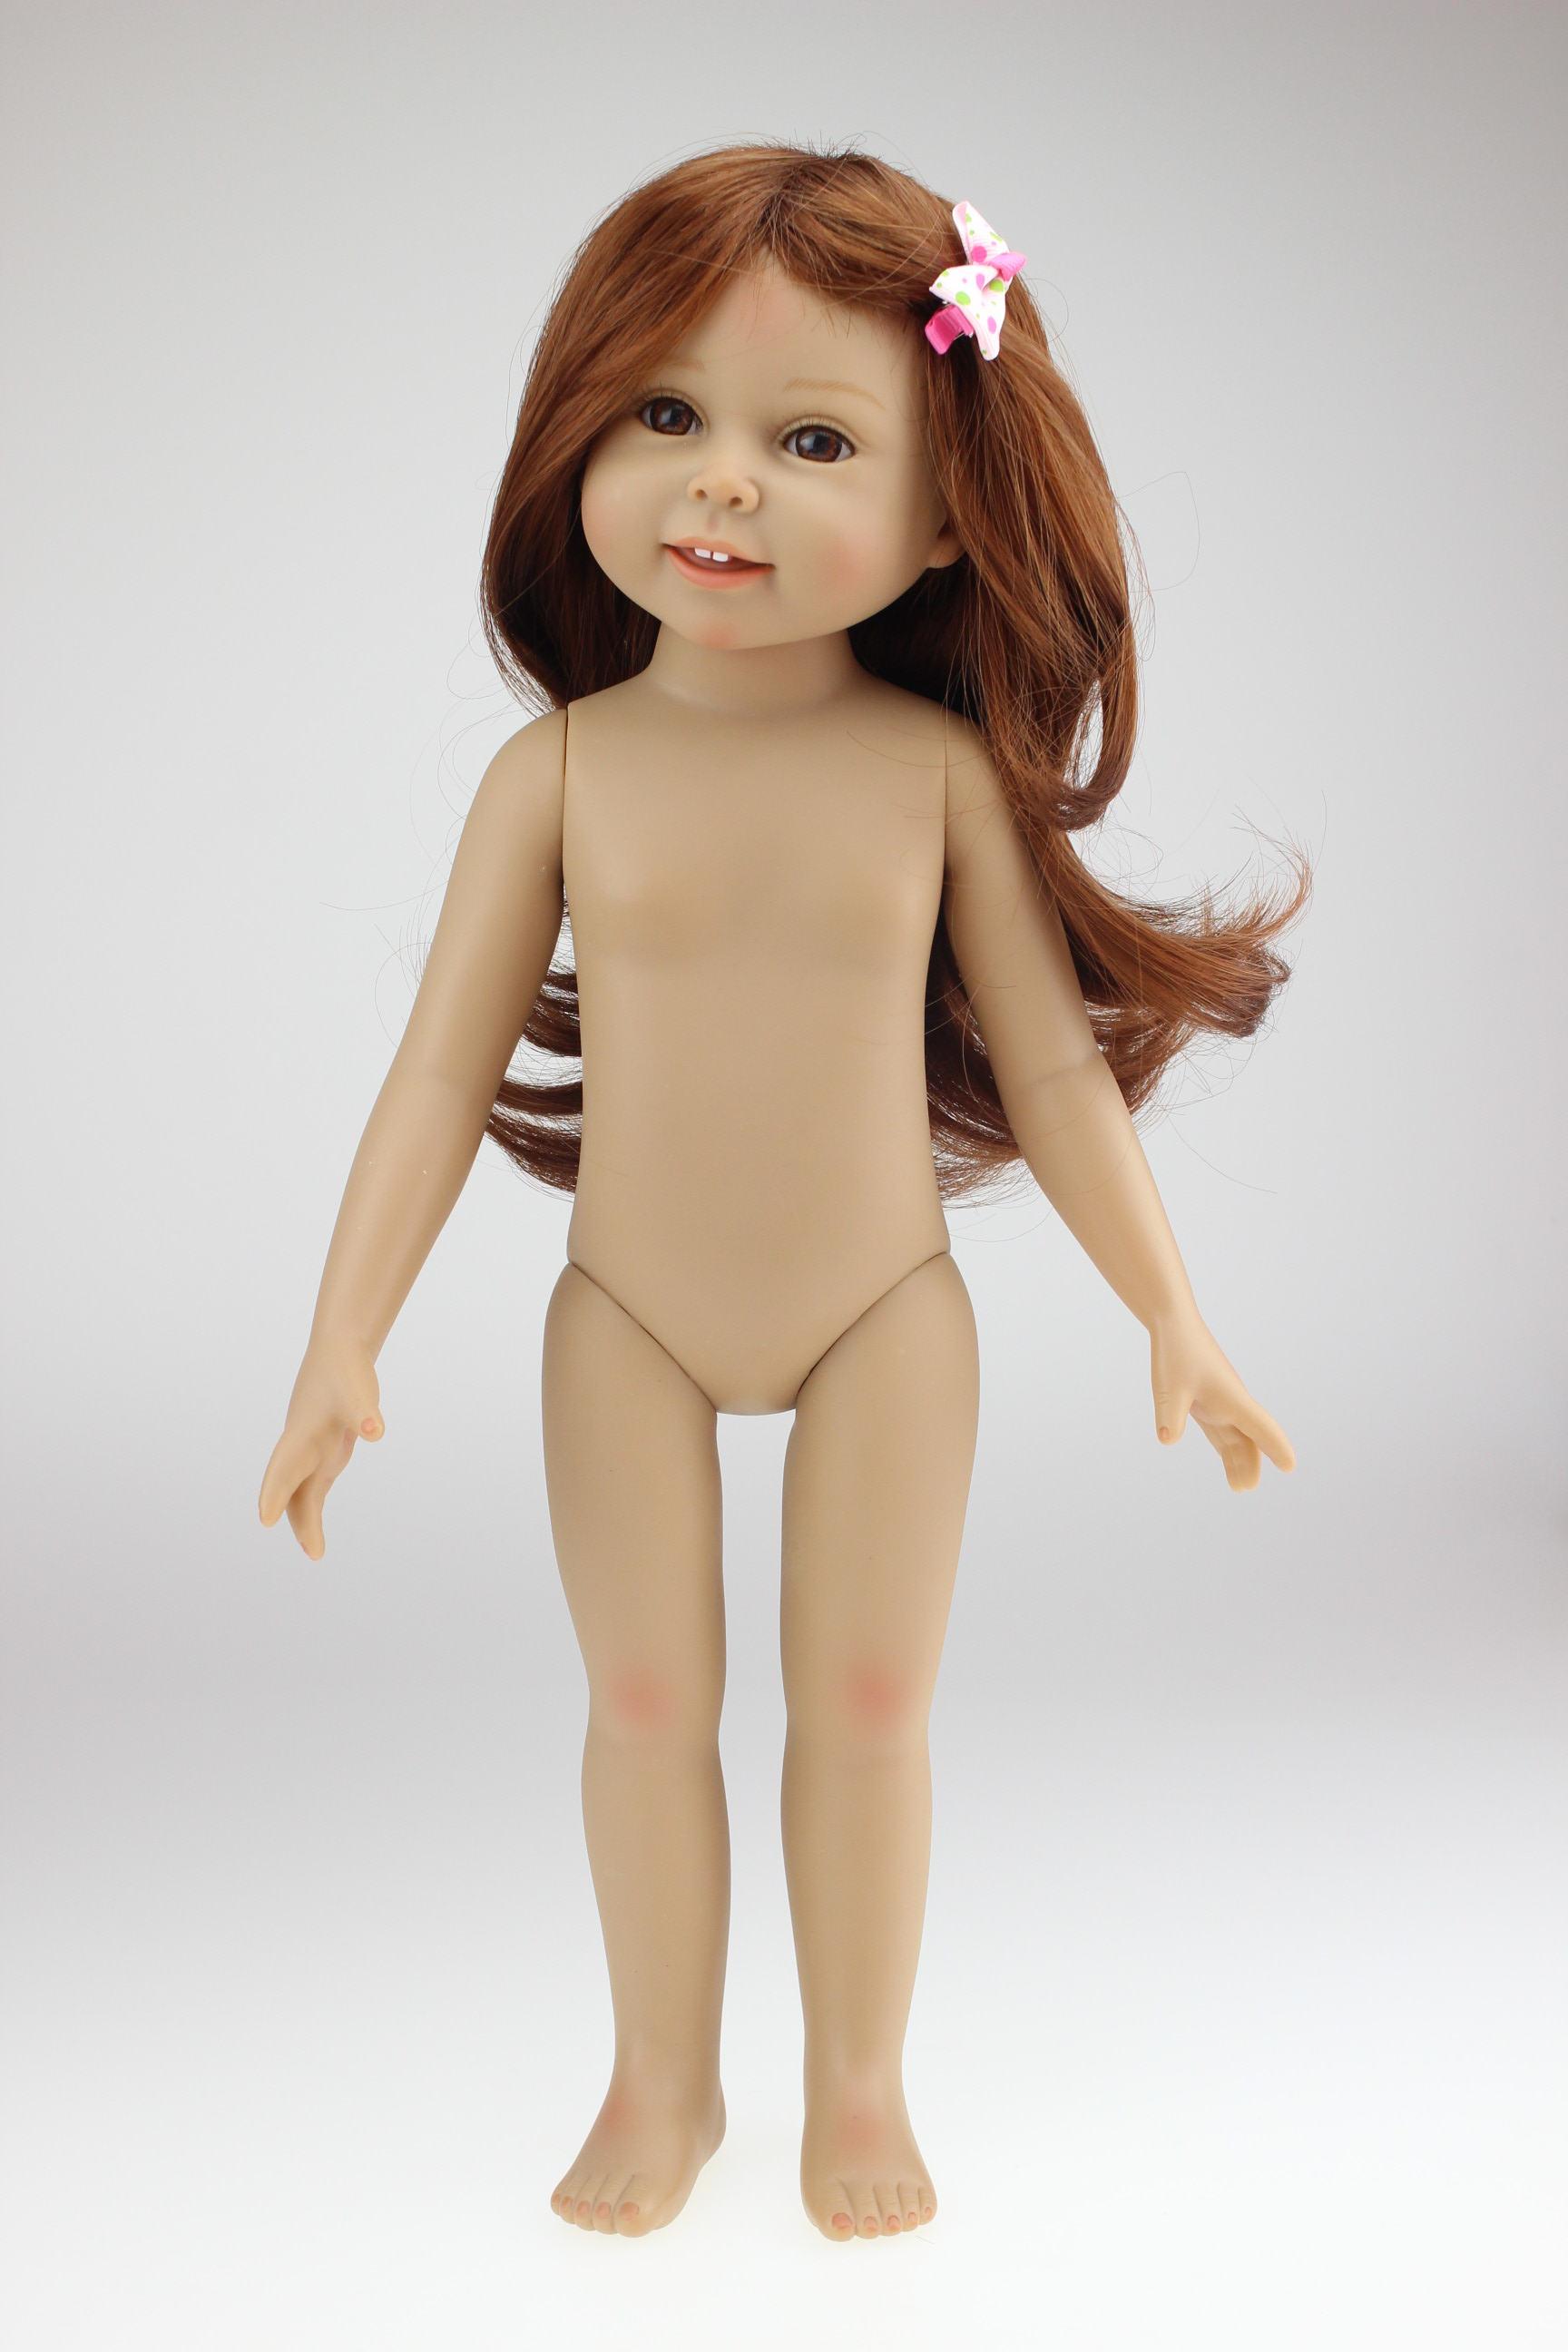 Naked Doll 3